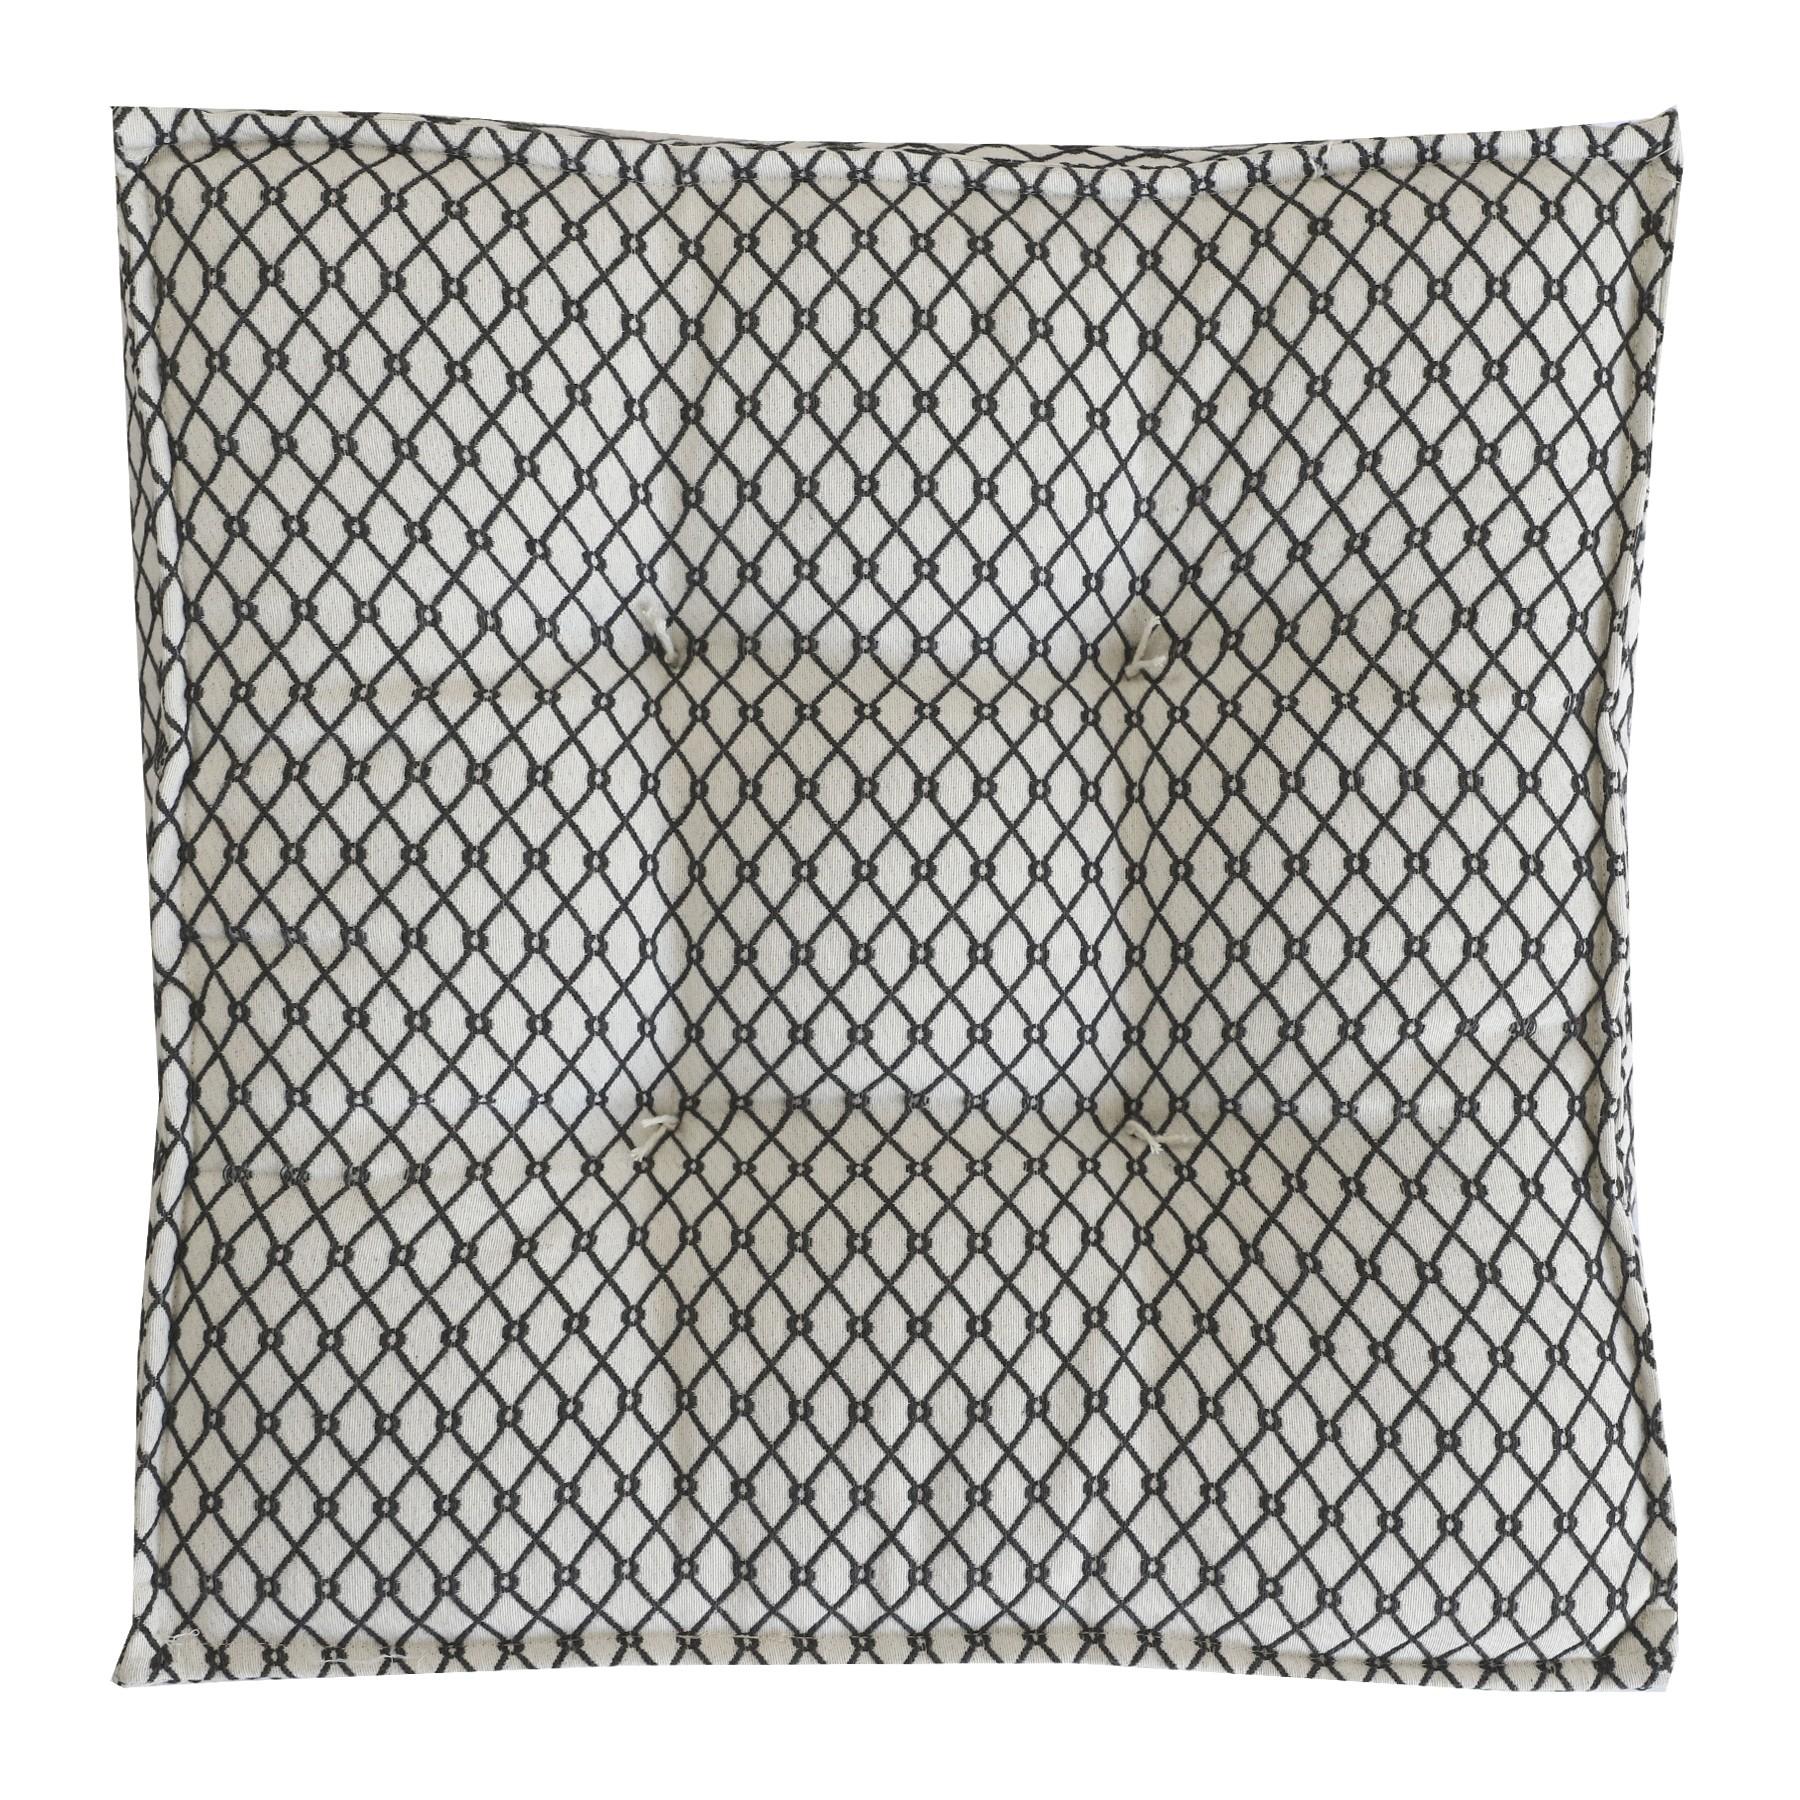 Almofada Futton Jacard 45 x 45 cm Cinza - Madritex